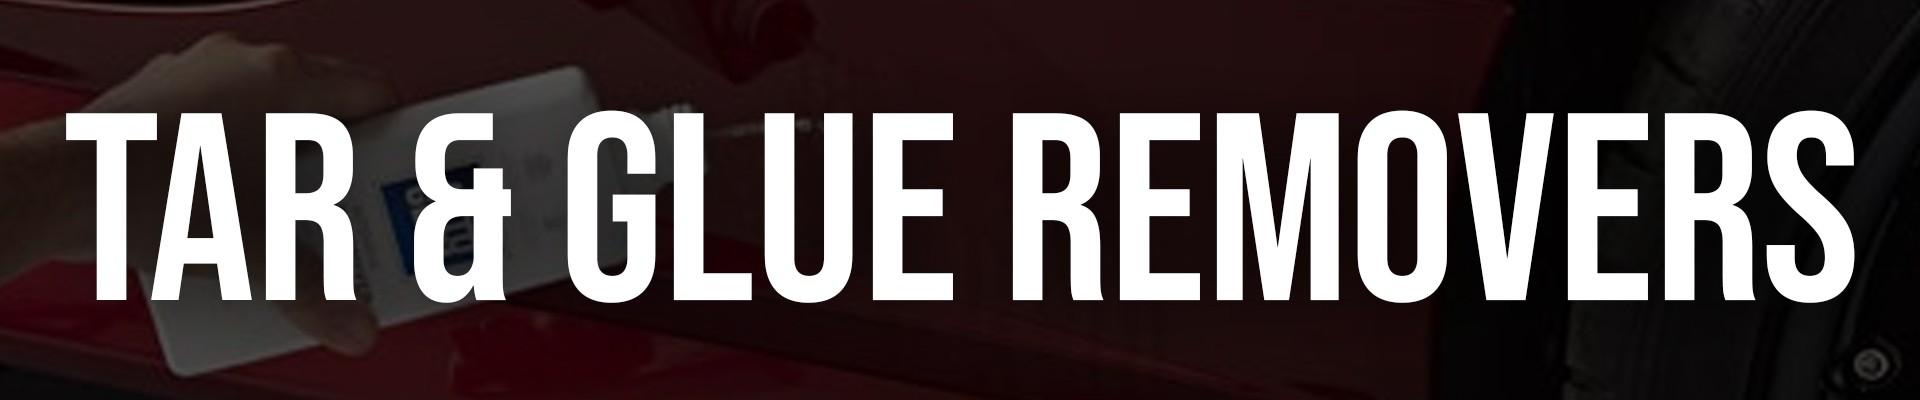 Bug, Tar & Glue Removers Banner